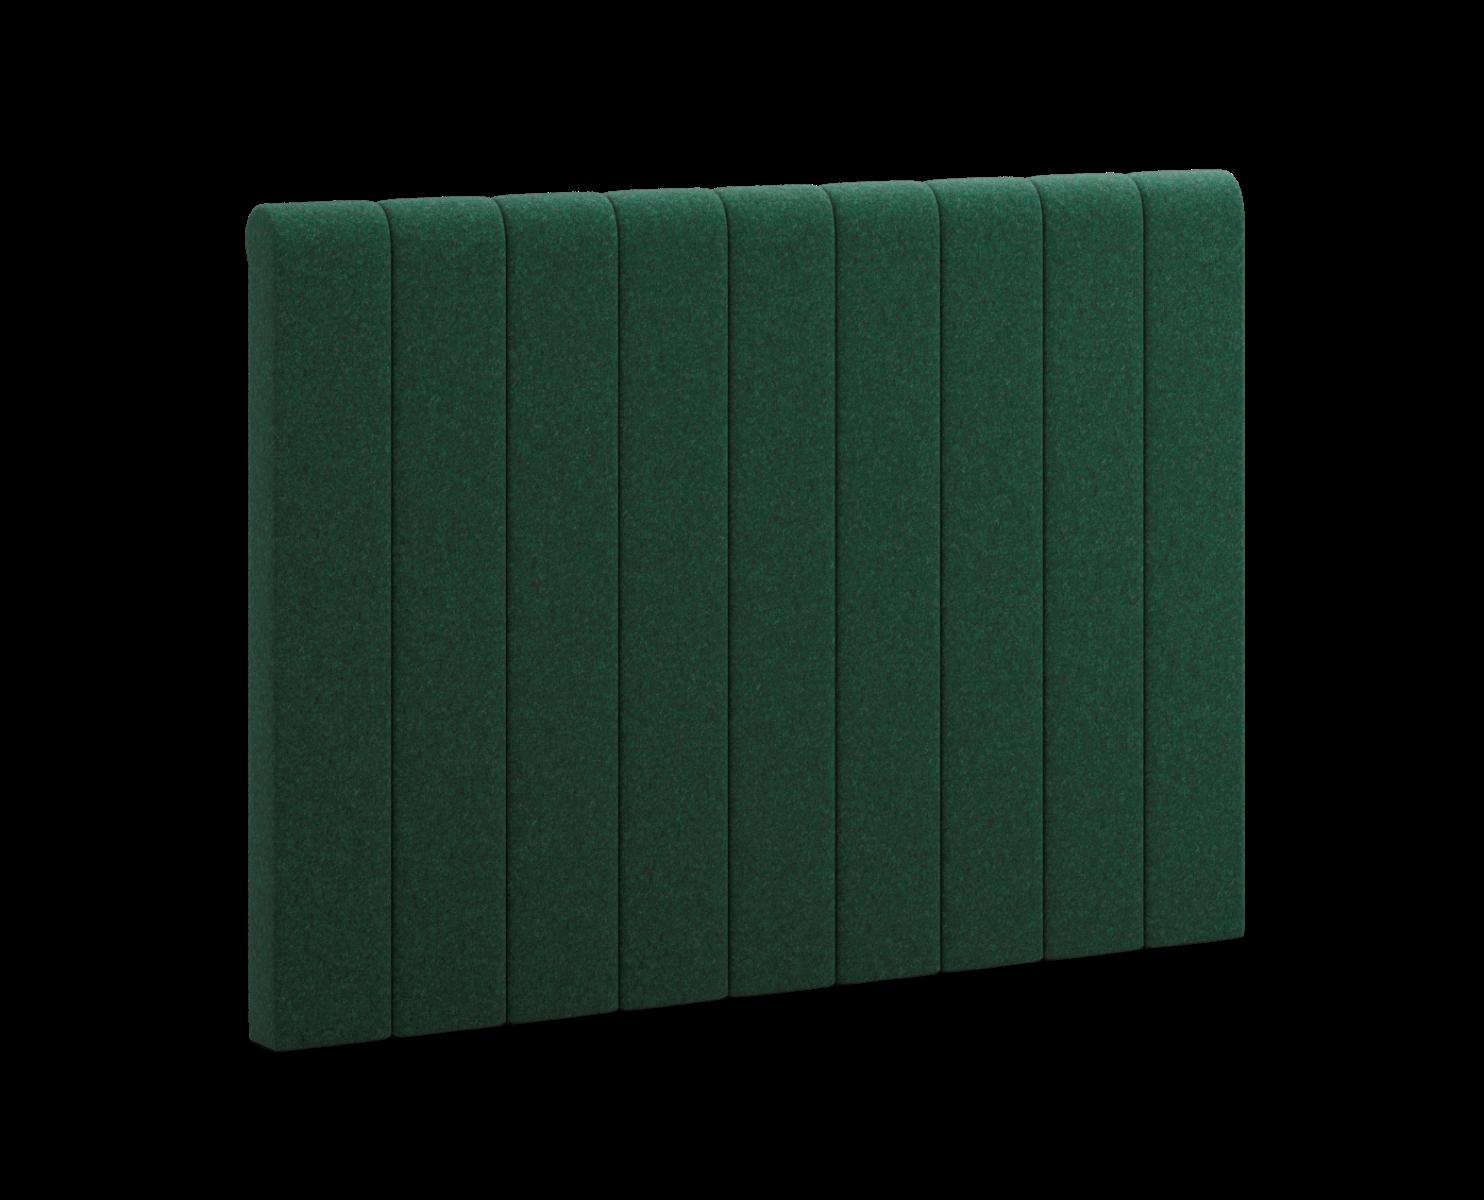 Køb Ovia Regal - 210x130x10 Grønn